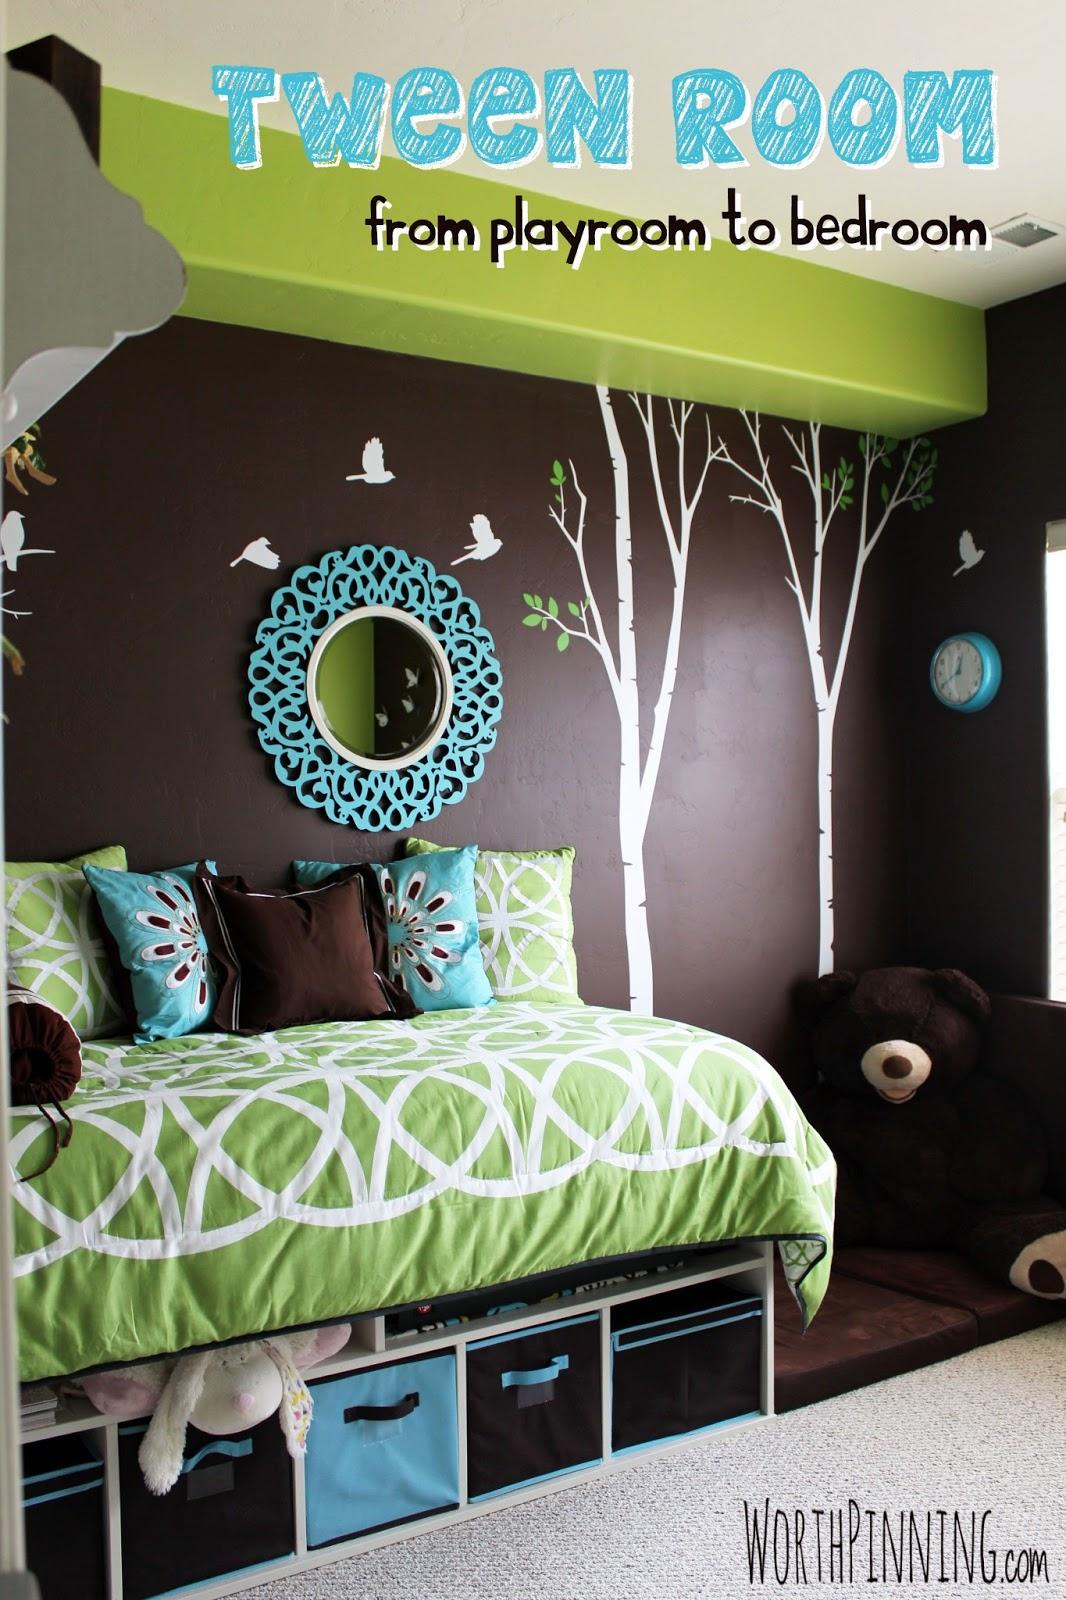 Tiny Box Room Made Into Cool Pre Teen Boys Bedroom: Worth Pinning: Tween Girl Room